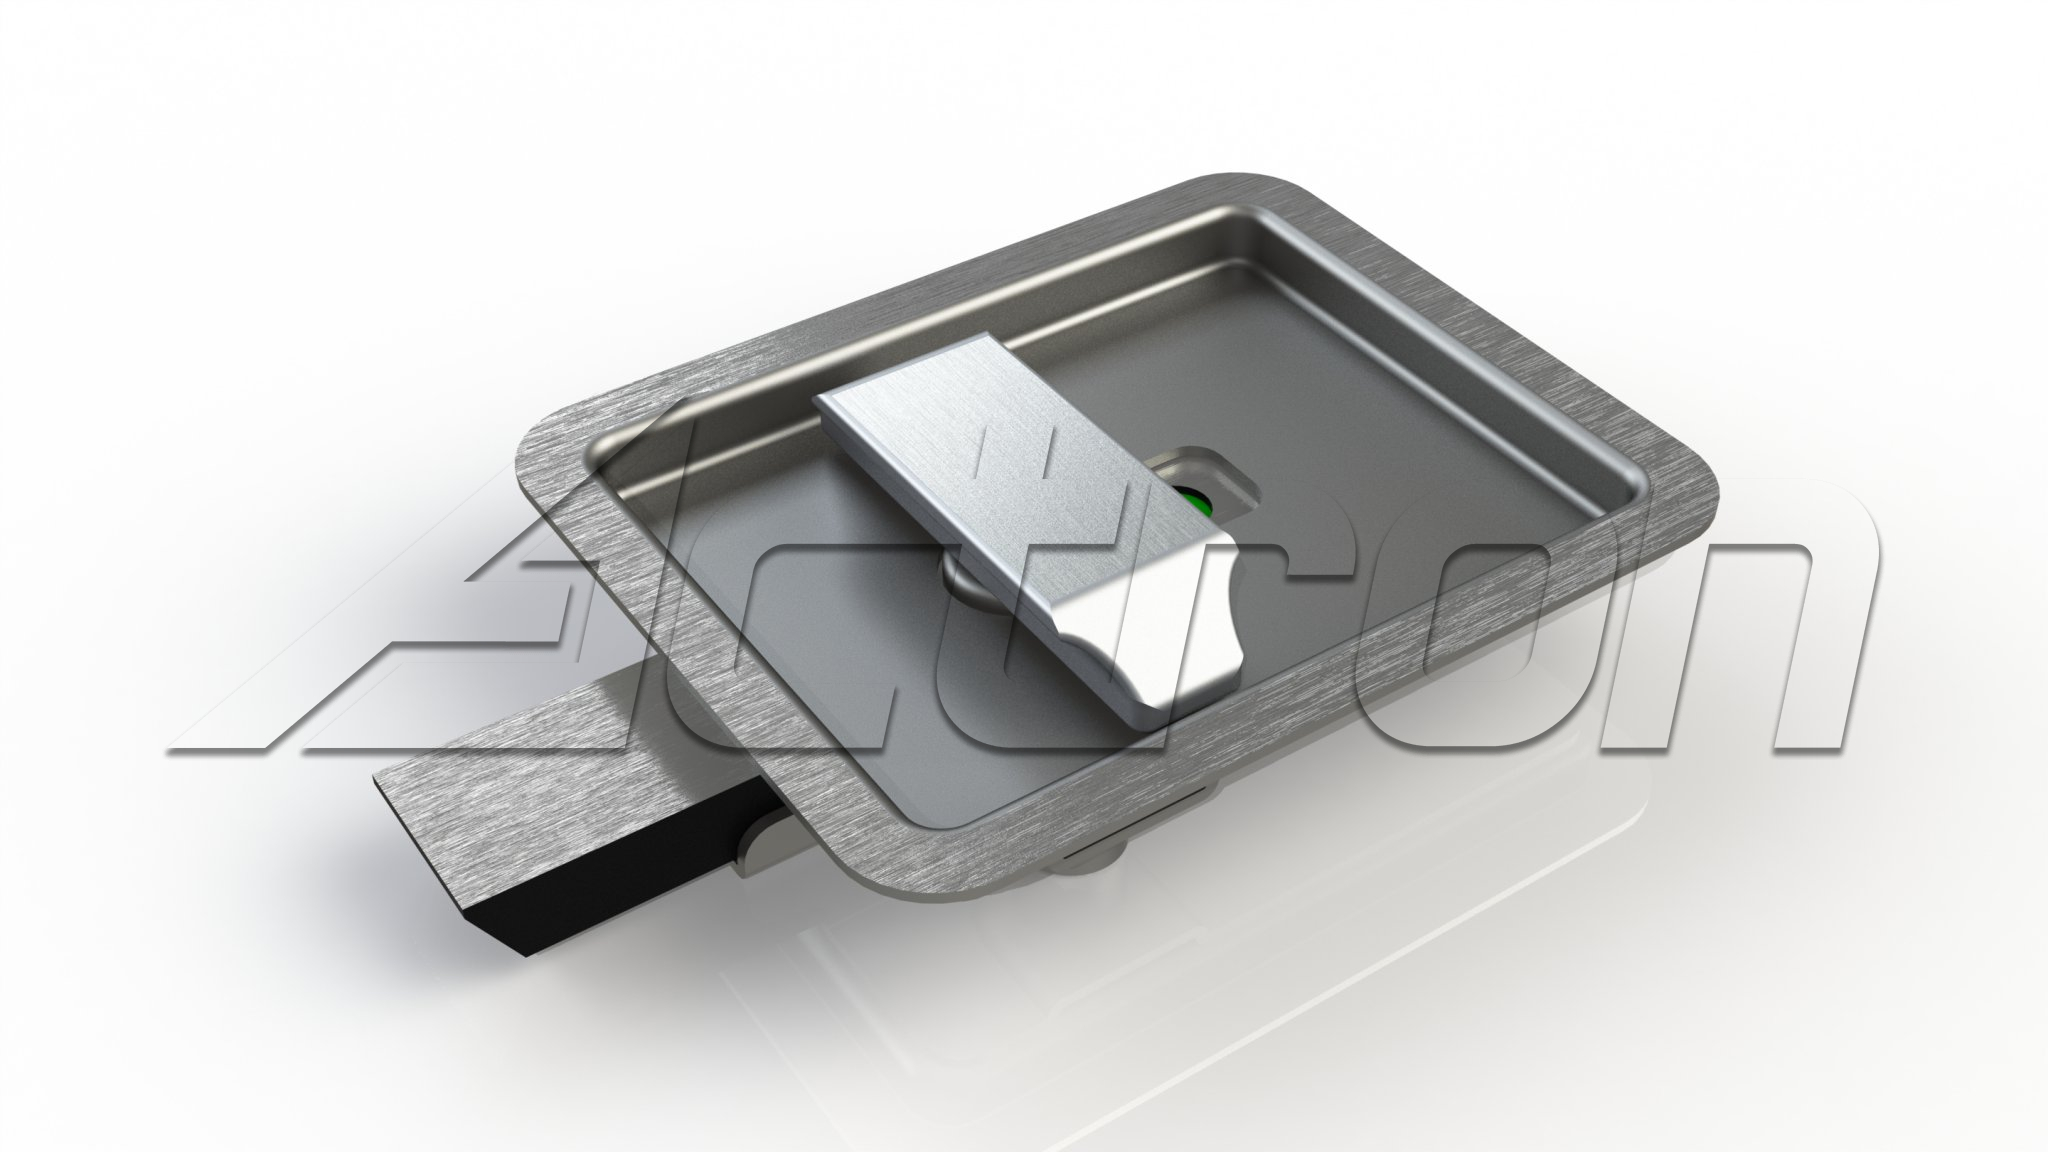 latchlock-assy-8211-sliding-4486-a27034.jpg